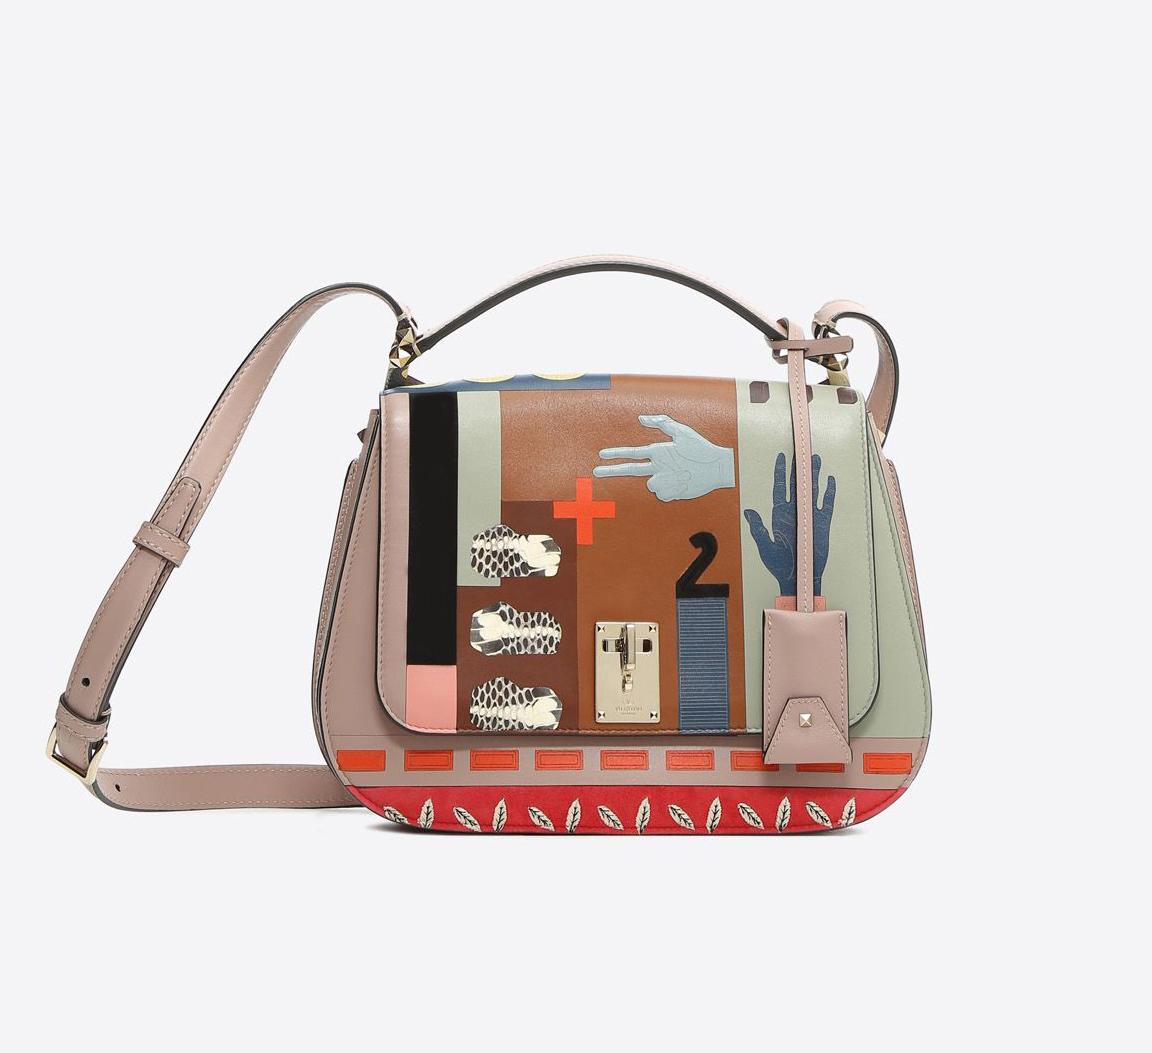 a1db1c8851f59 أحدث موديلات حقائب اليد من فالنتينو